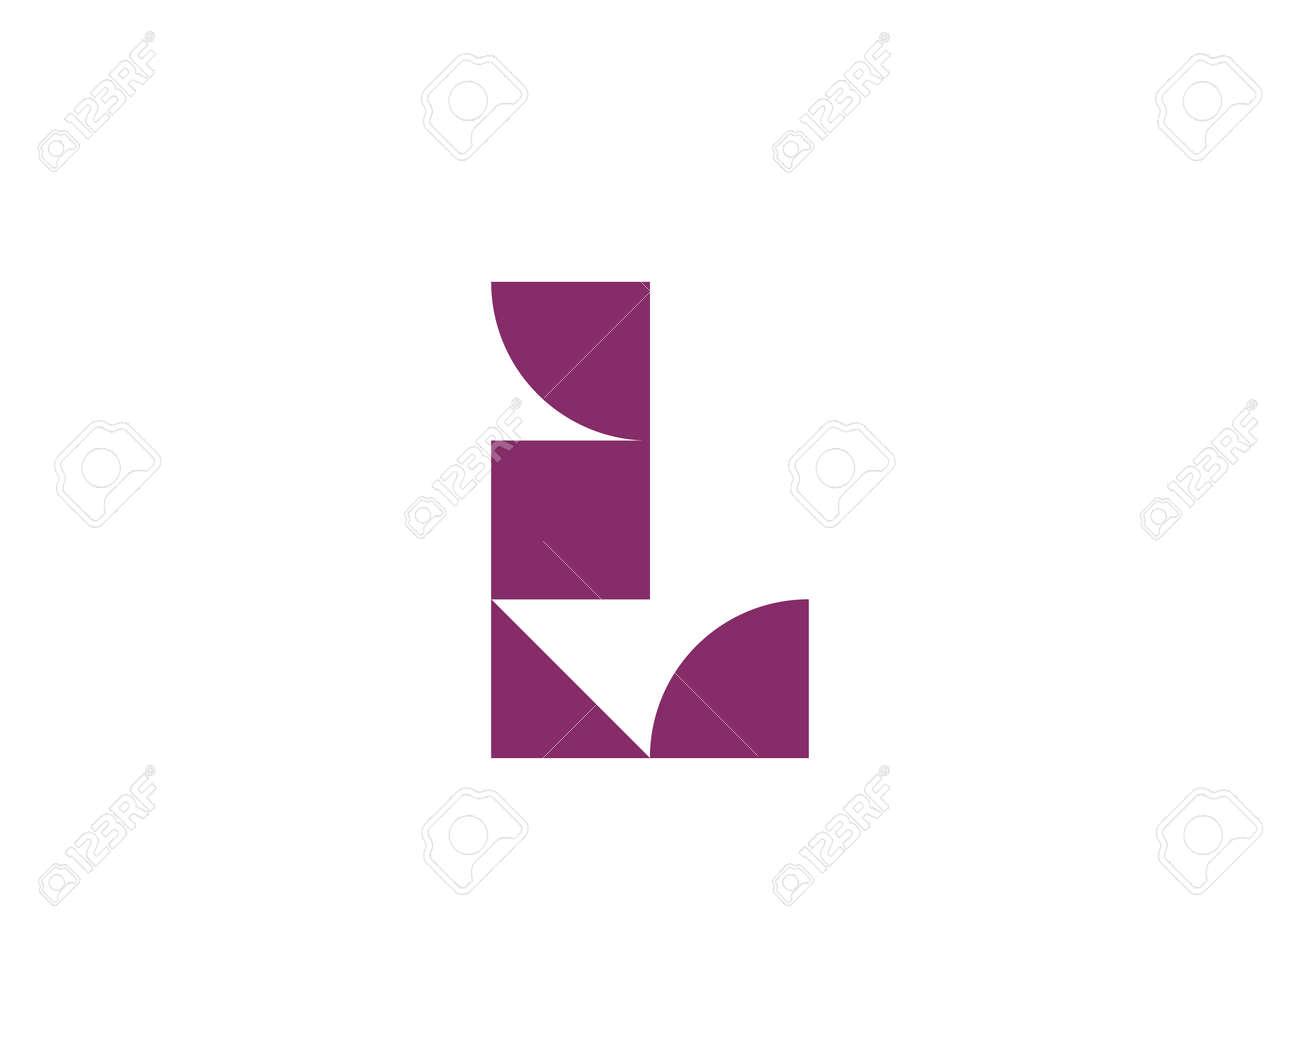 Abstract letter L logo icon design modern minimal style illustration. Creative alphabet from purple geometric shapes emblem sign symbol mark logotype - 153264094